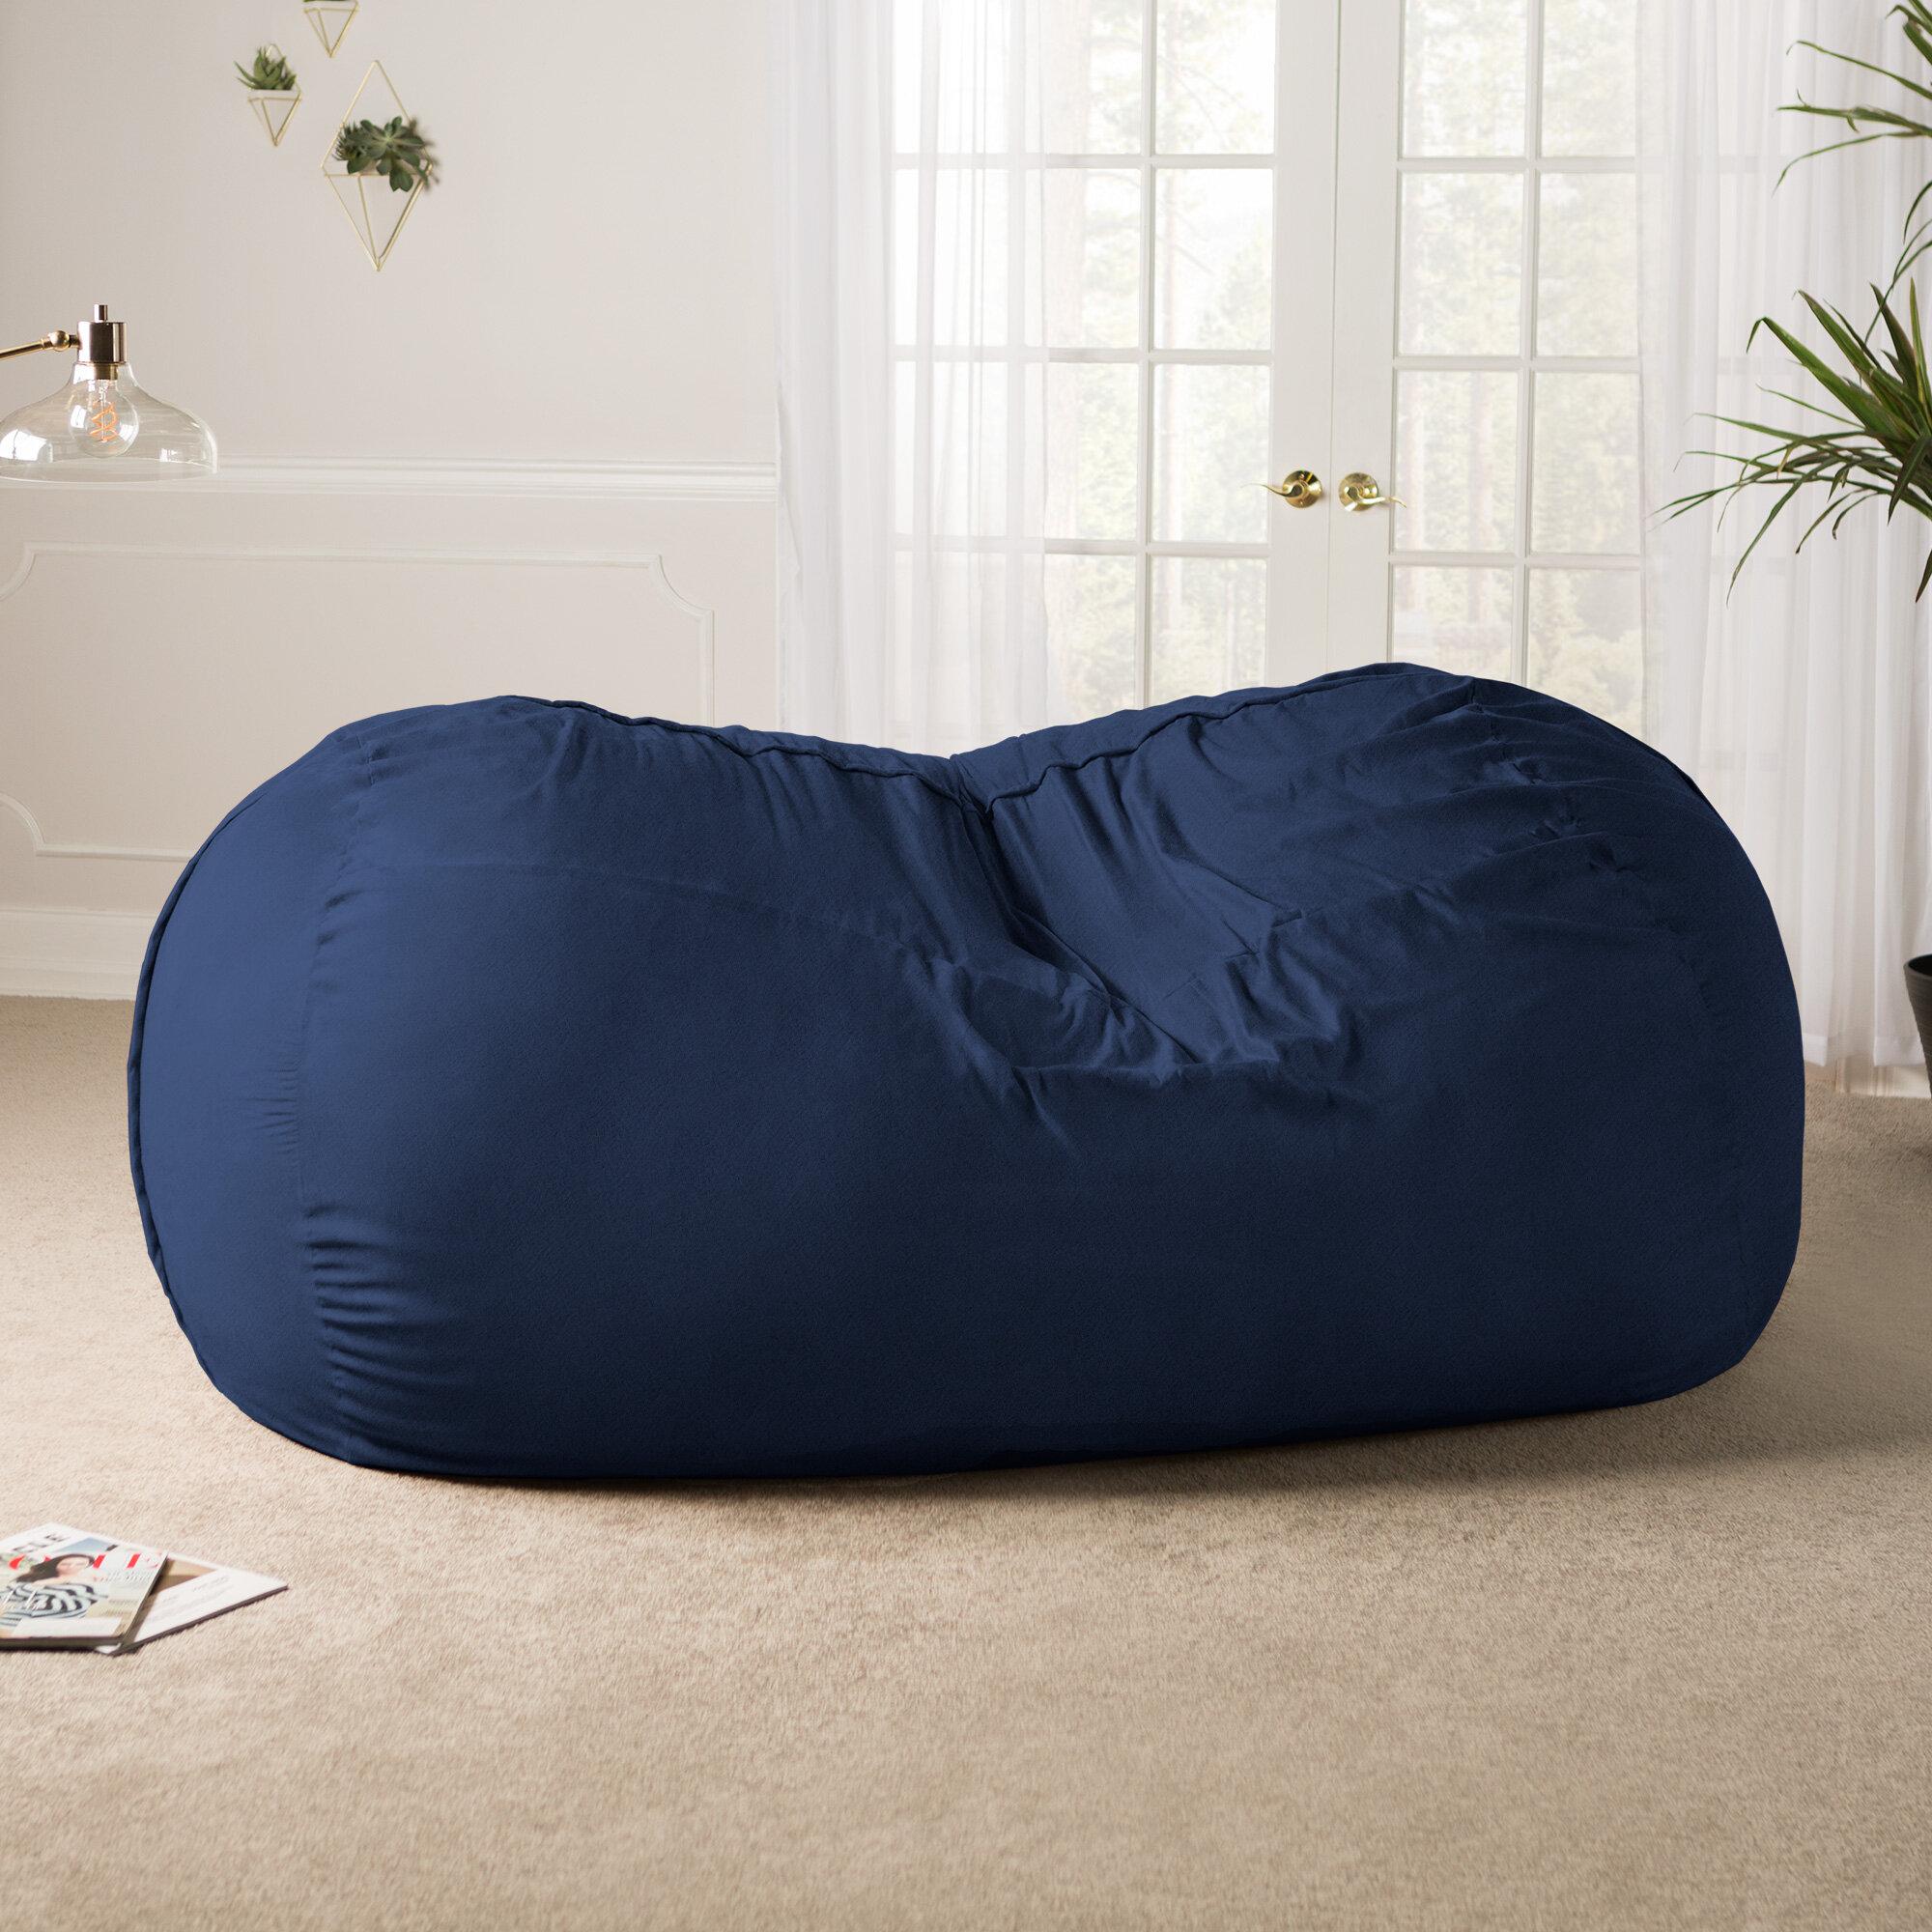 Latitude Run Giant Bean Bag Sofa U0026 Reviews | Wayfair